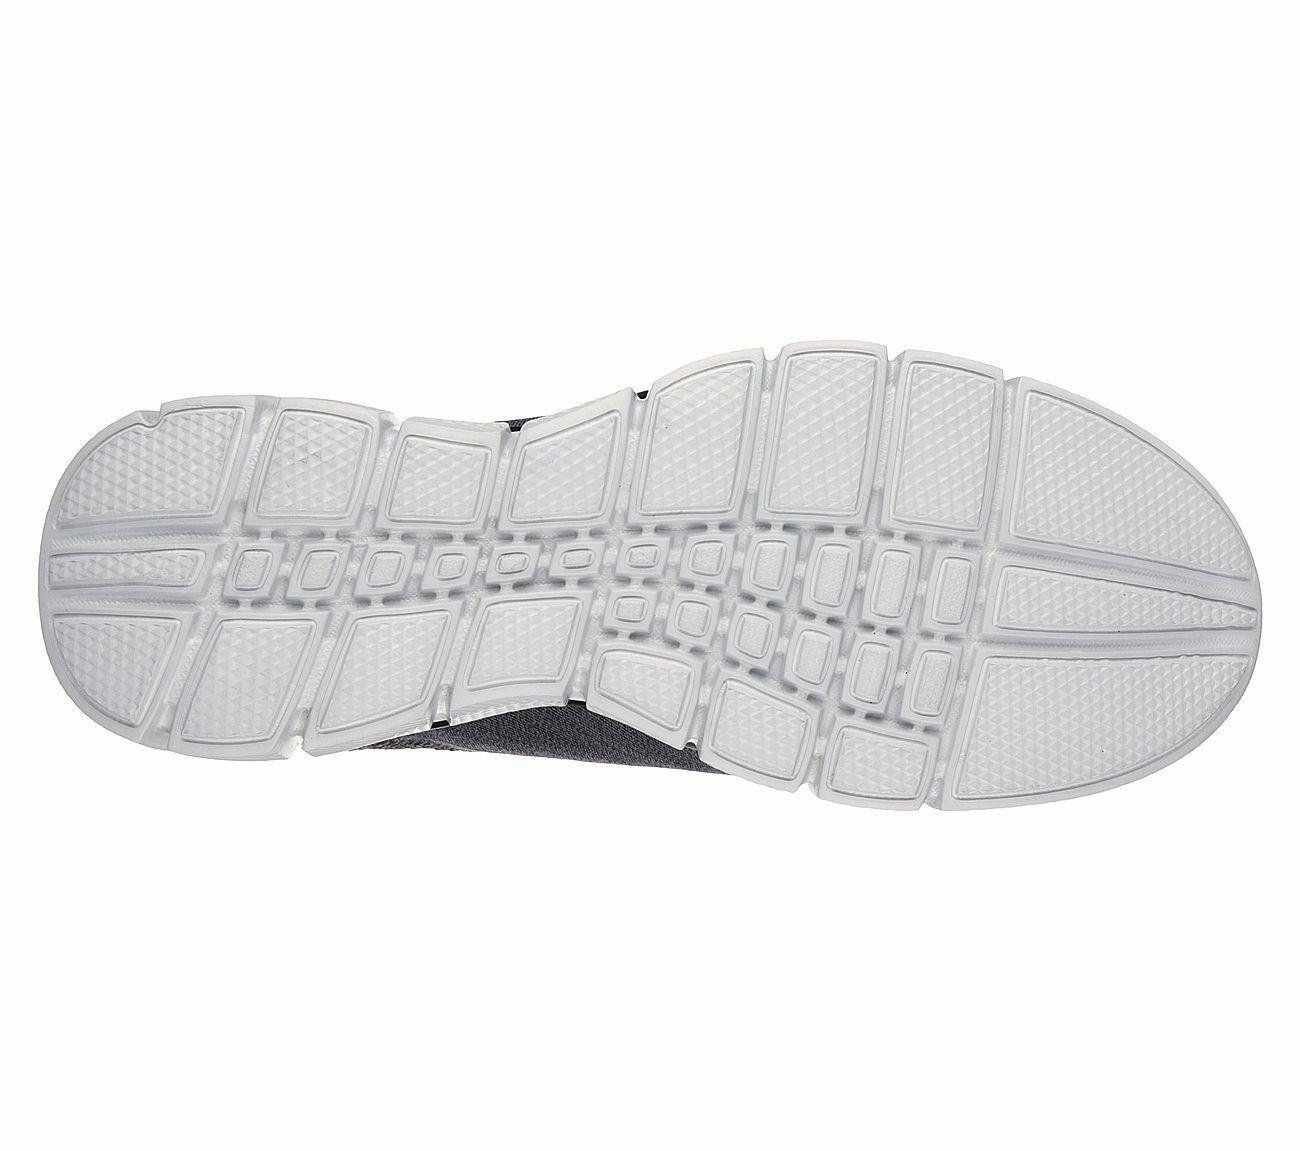 Skechers Charcoal Extra Wide Fit Shoes Men Memory Foam Sporty Trail Hiking 51530